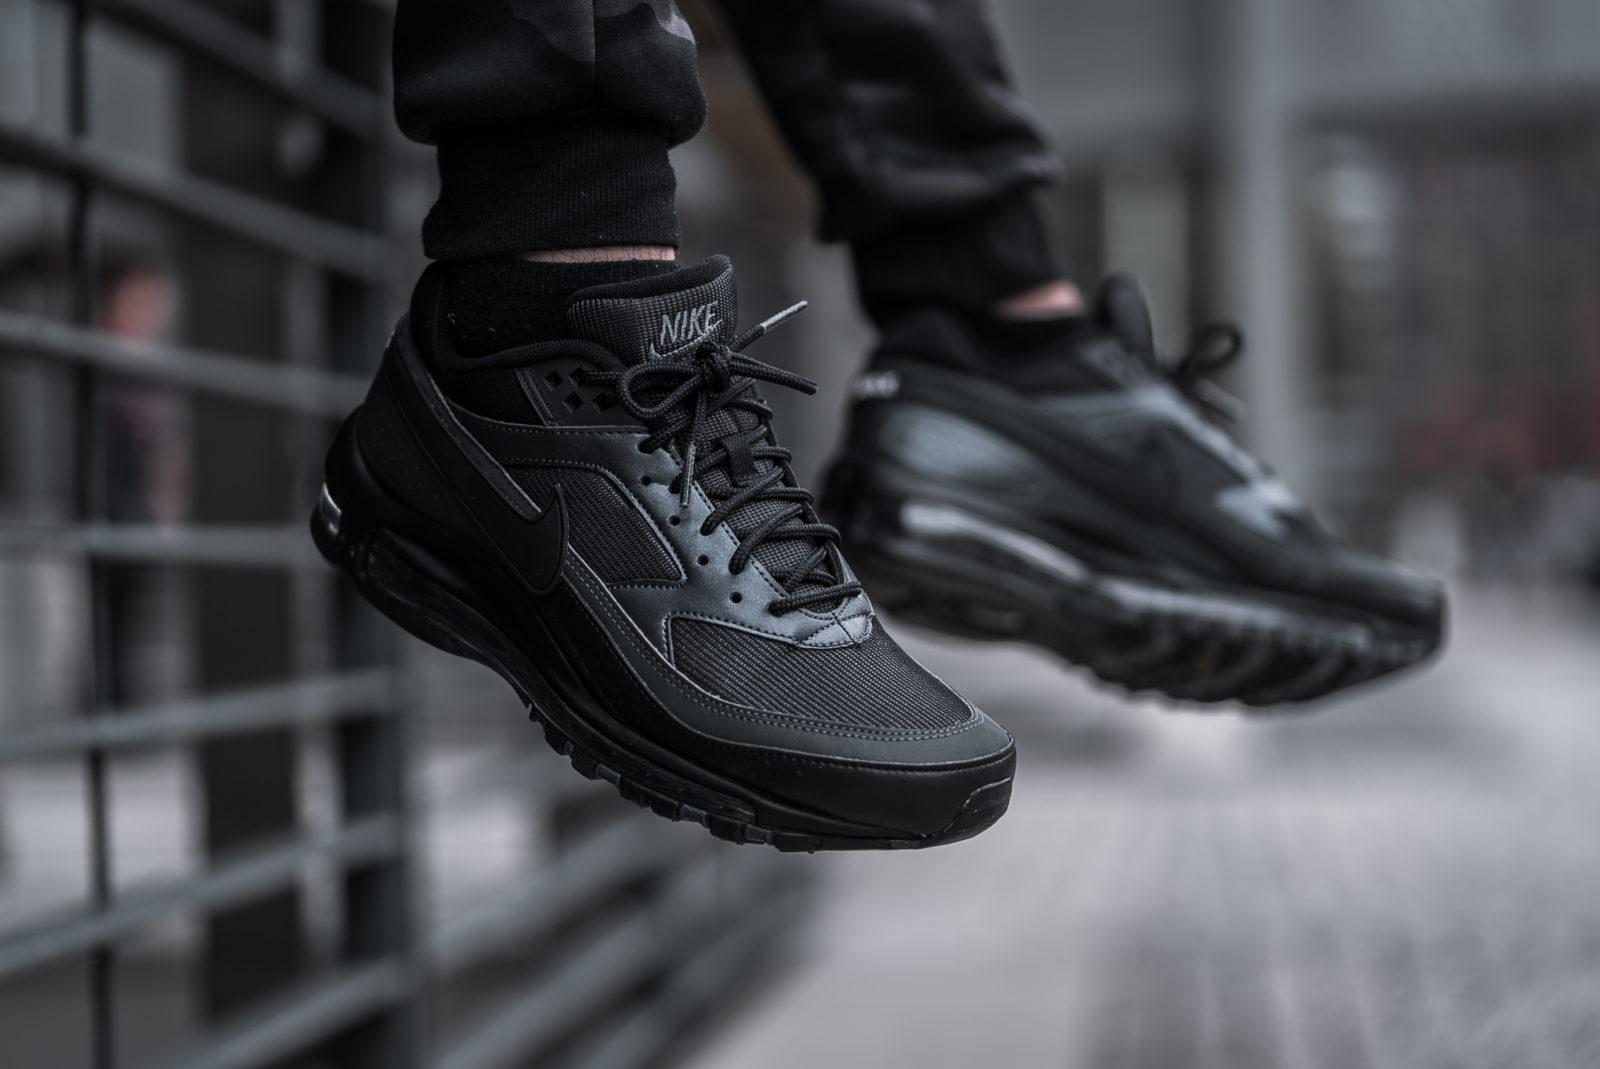 nike air max 97 triple black on feet